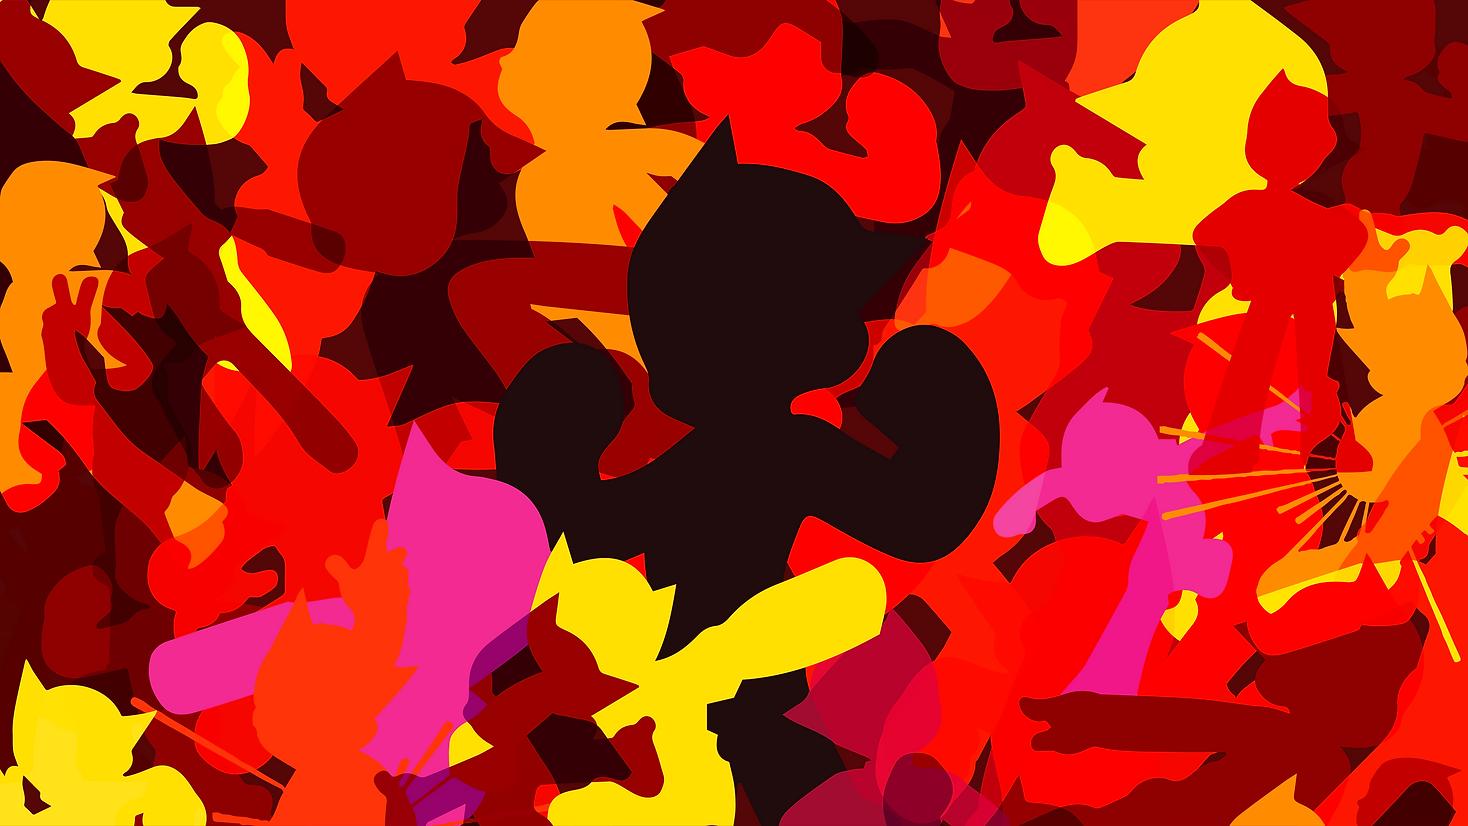 REIF-Astro Boy-Pattern-02.png